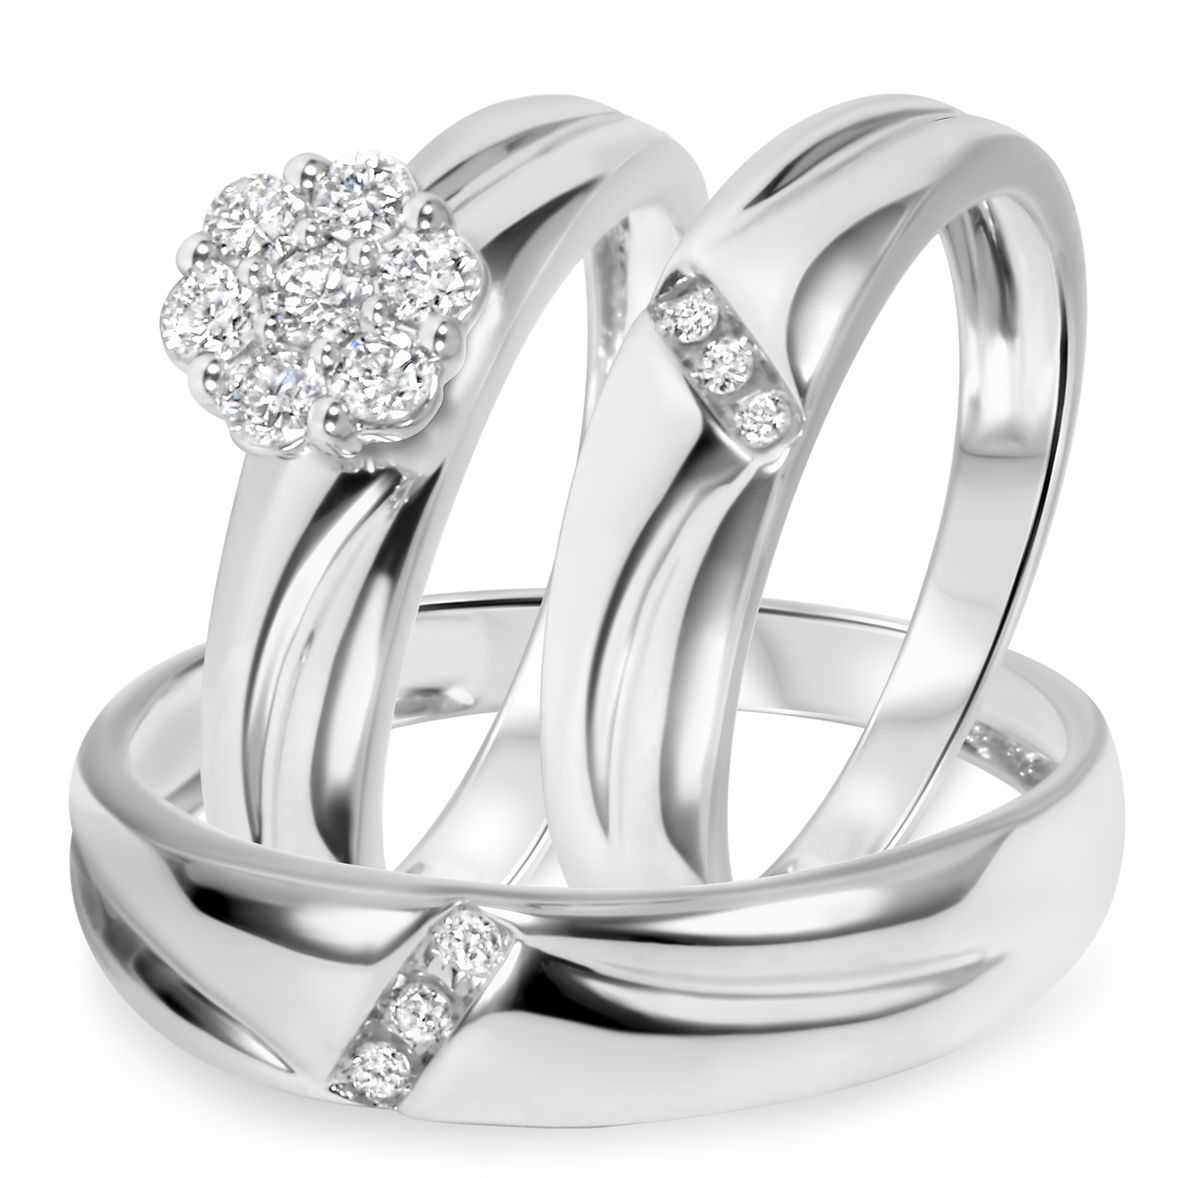 Diamond Trio Set His Hers Matching Engagement Ring Wedding Band White Gold